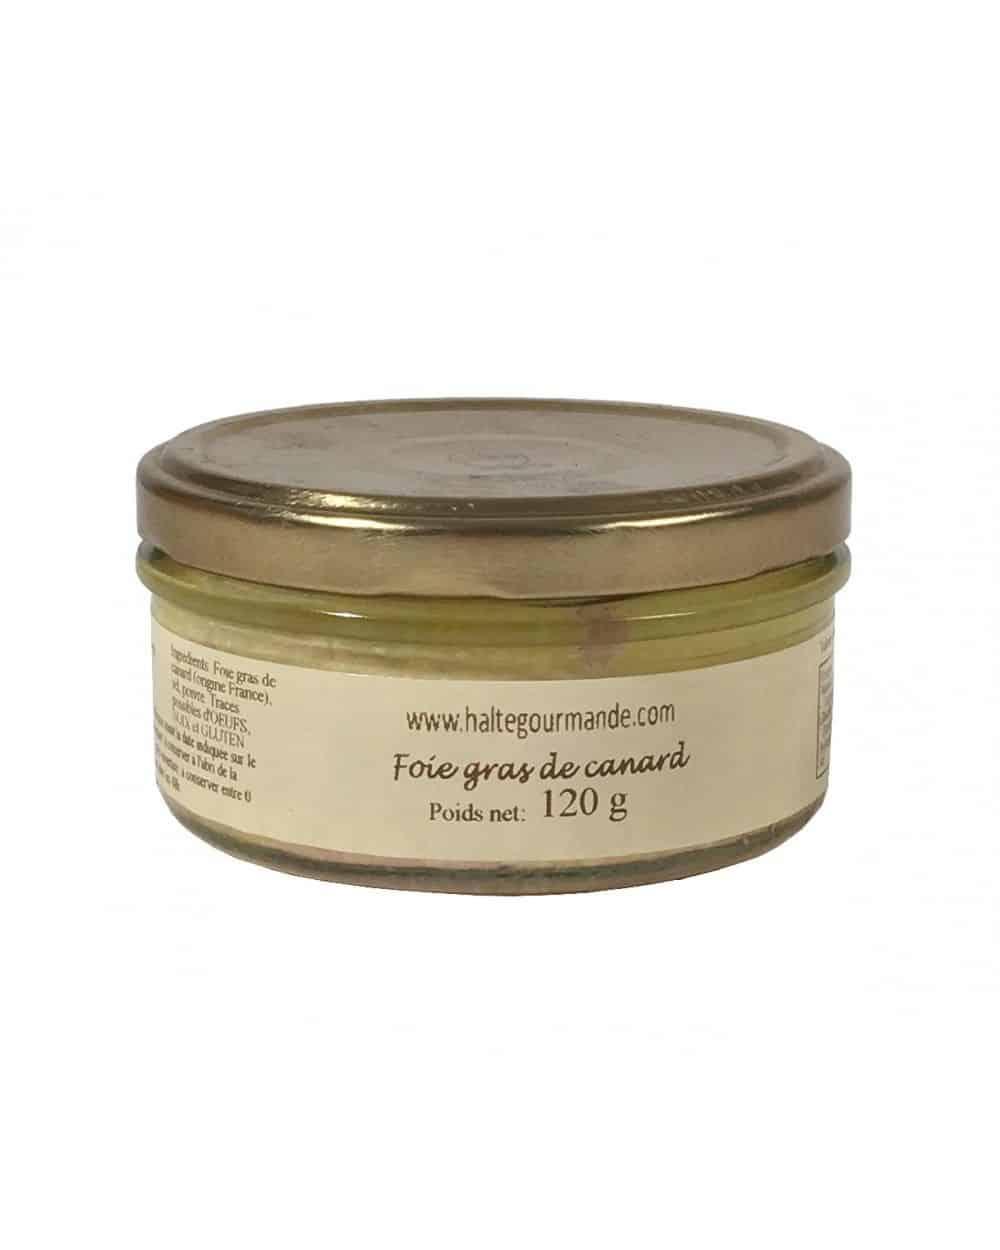 Foie gras de canard en verrine 120g